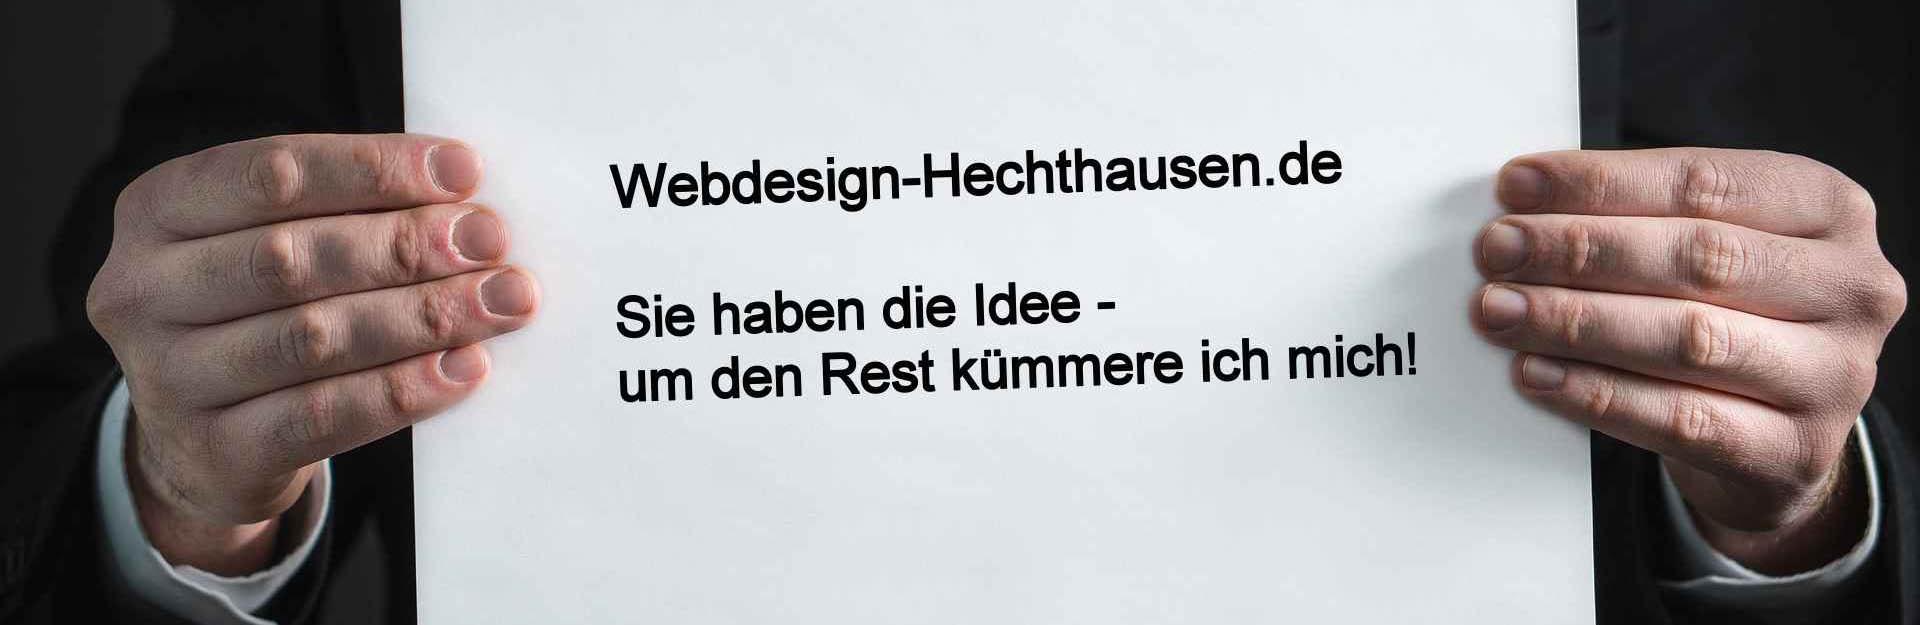 Webdesign Hechthausen Homepage Webseiten erstellen Stade Cuxhaven Hemmoor Homepage erstellen Hechthausen